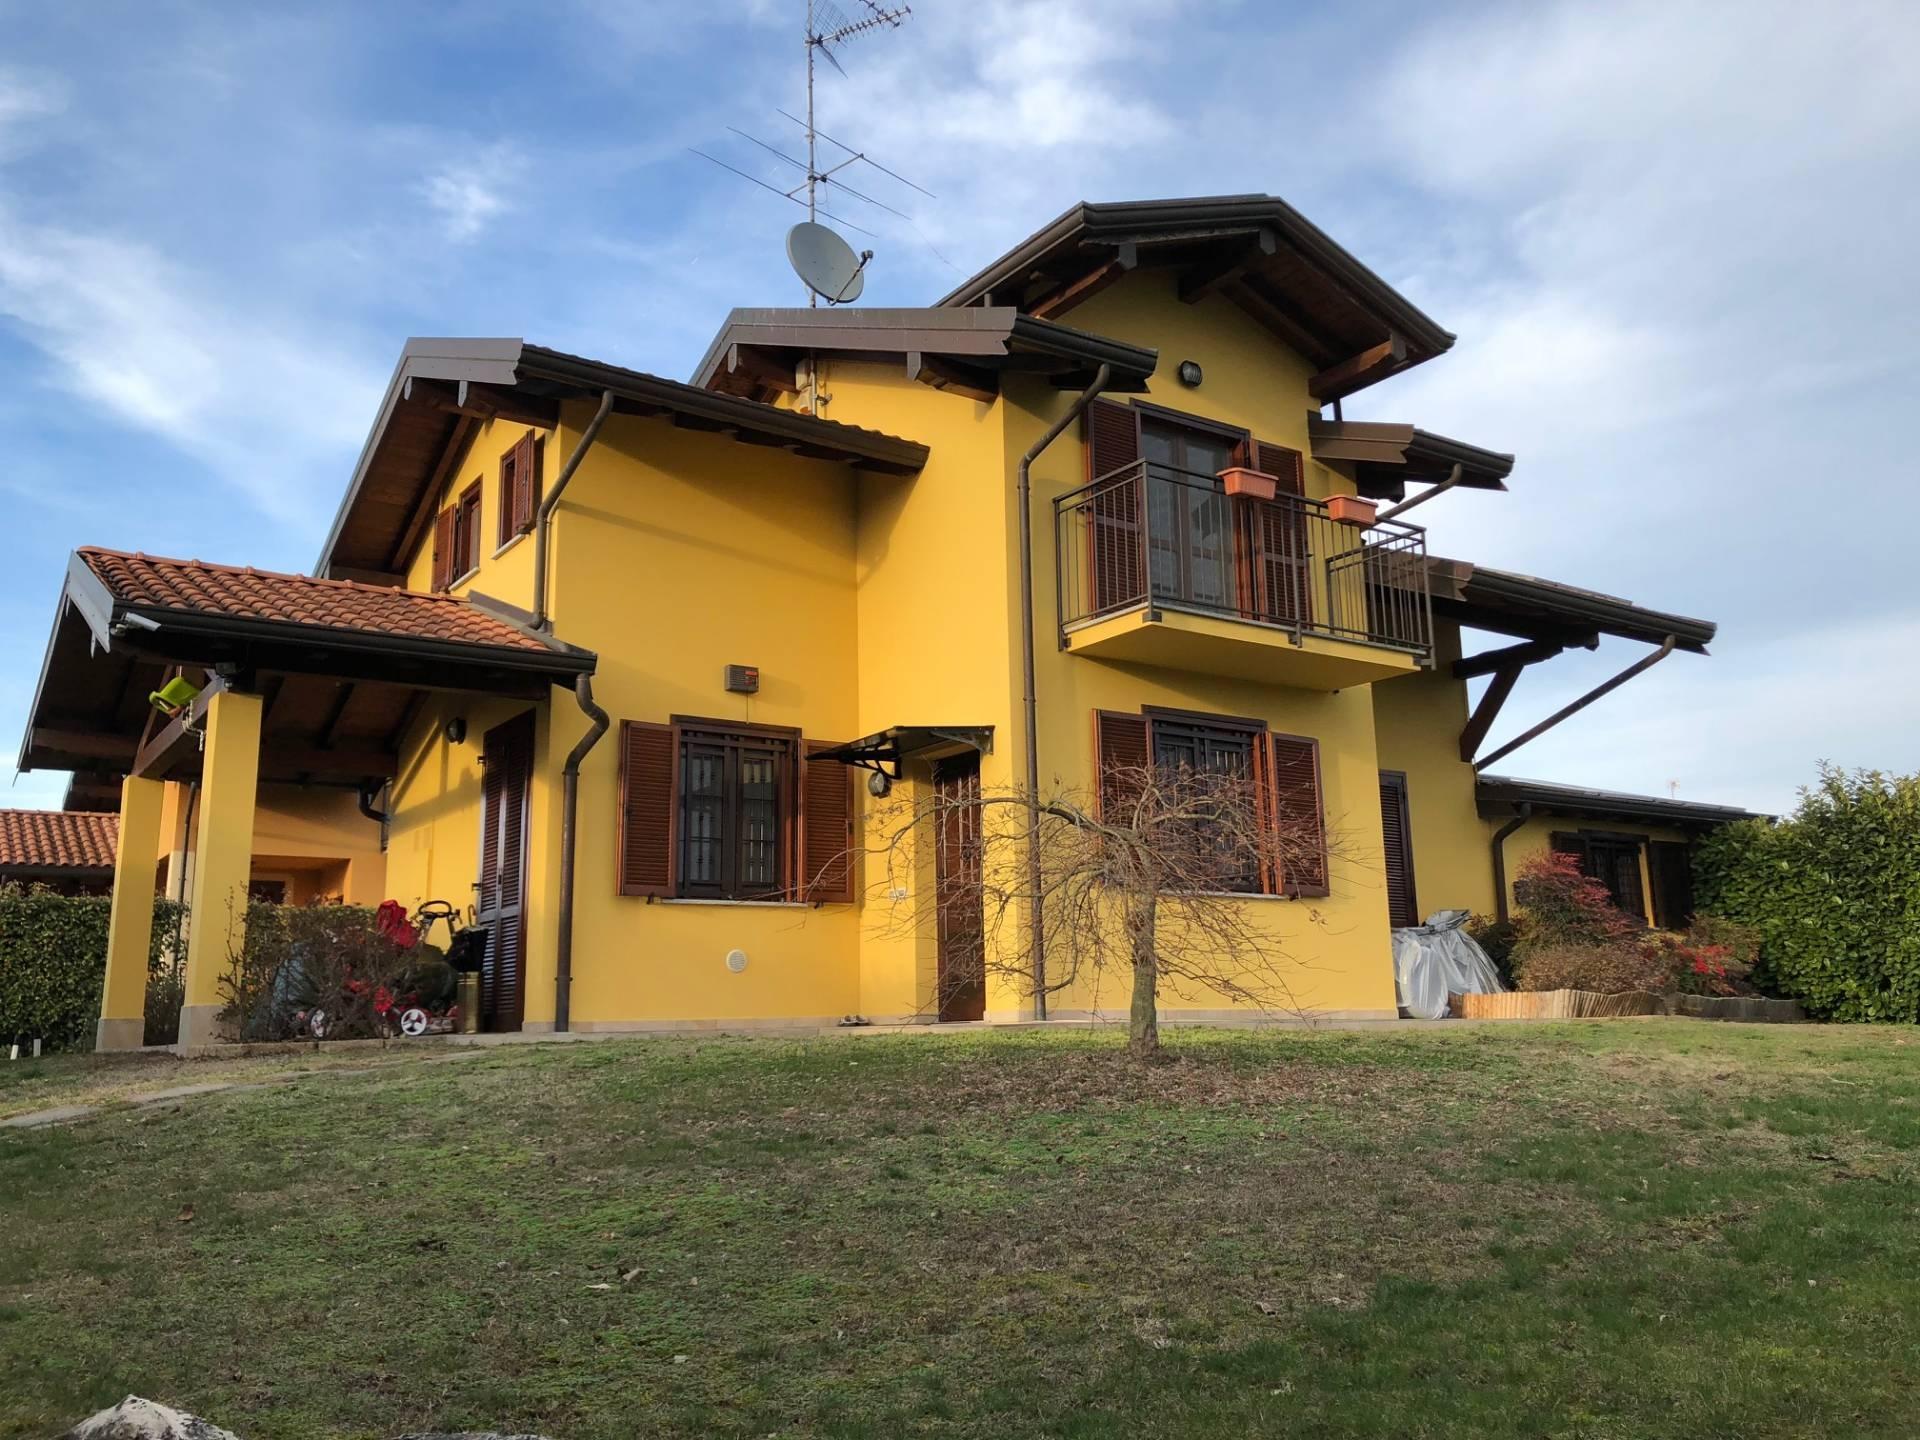 Villa Mezzomerico